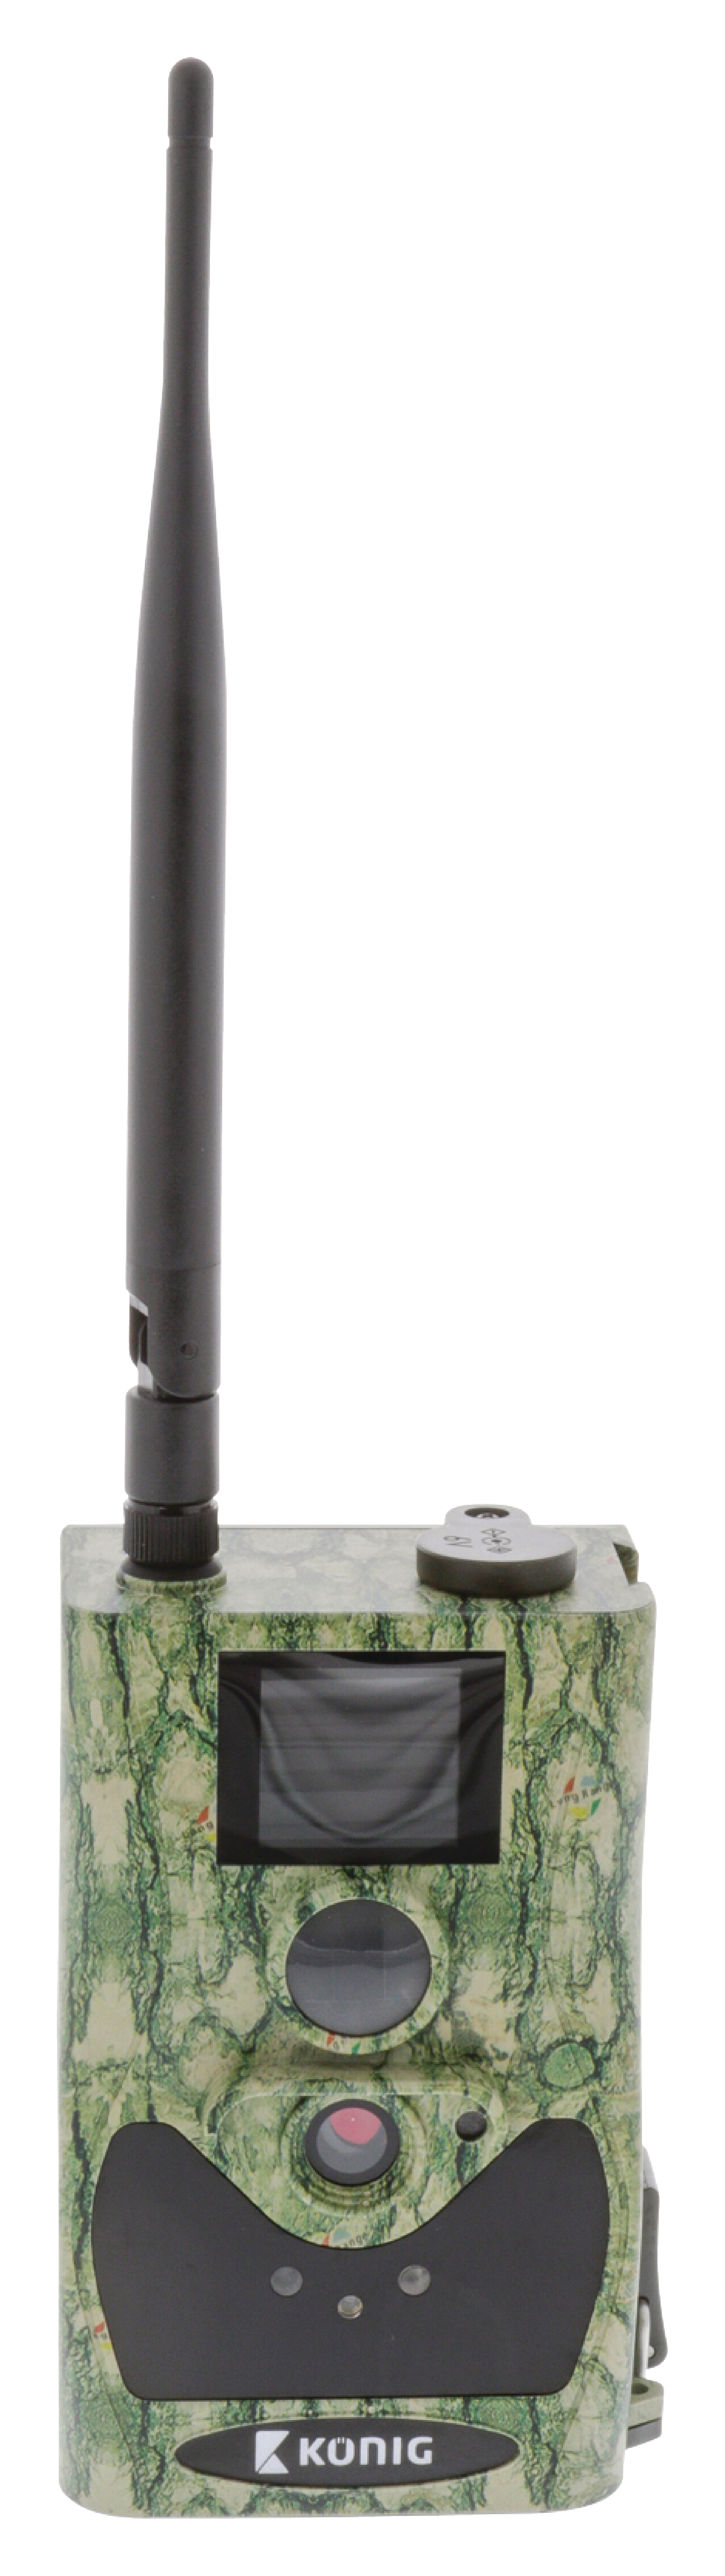 sas dvrodr31 k nig cam ra de camouflage pour la faune 12 0 mpixel gprs electronic. Black Bedroom Furniture Sets. Home Design Ideas